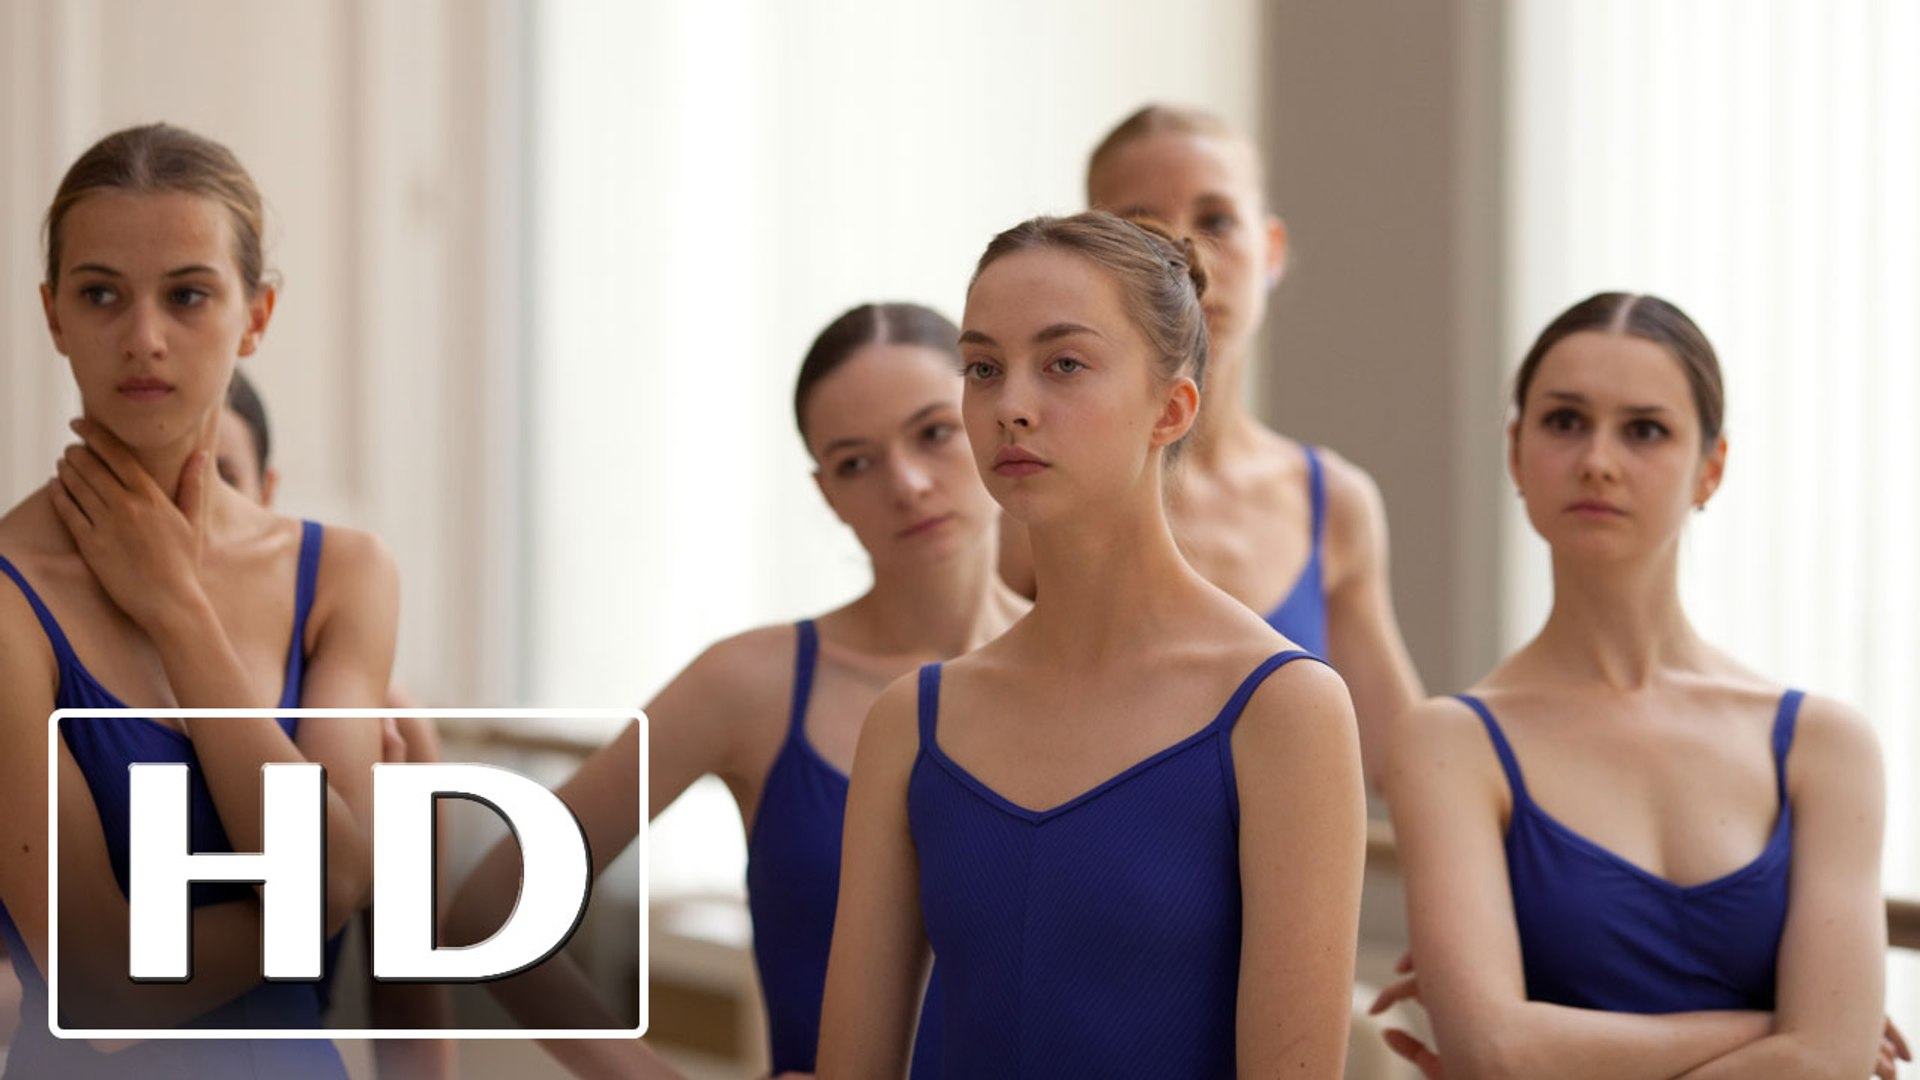 Watch Polina (2017) Full Movie Free Stream in HD 720p